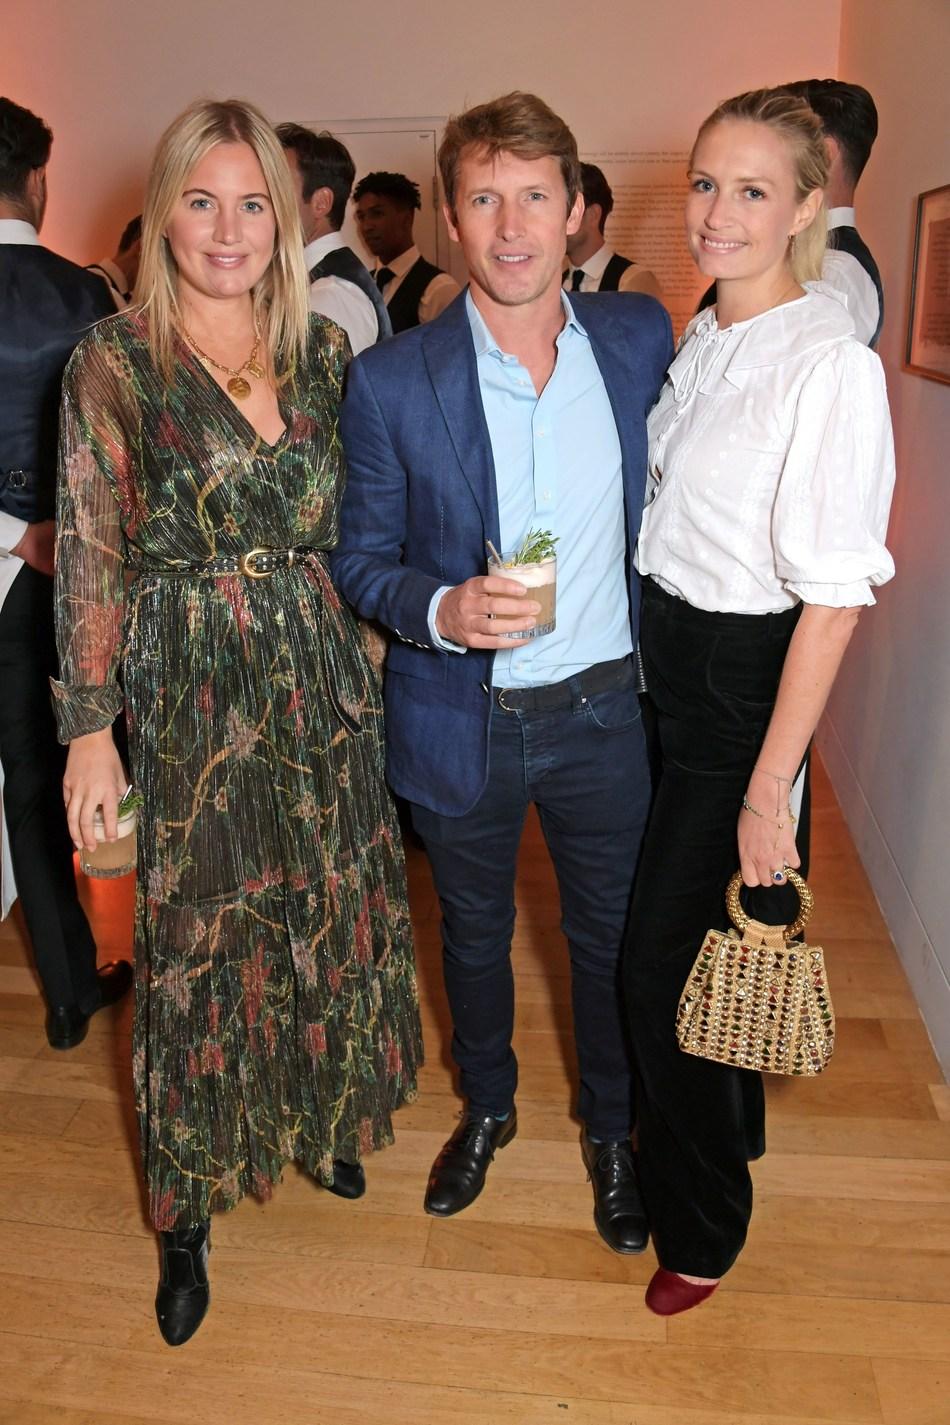 Marissa Montgomery, James Blunt and Sofia Wellesley at the Champagne Armand de Brignac Blanc de Noirs Assemblage Three Launch